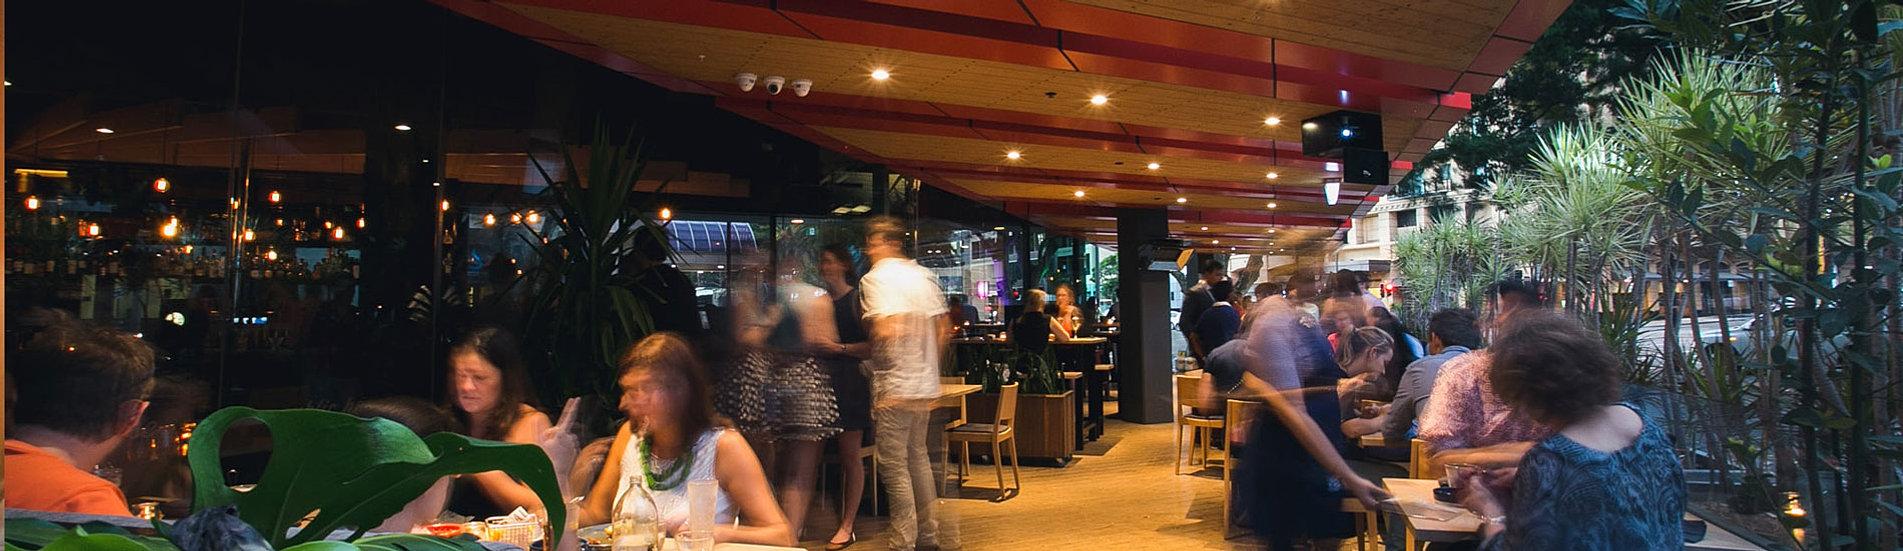 South Terrace Restaurants Adelaide